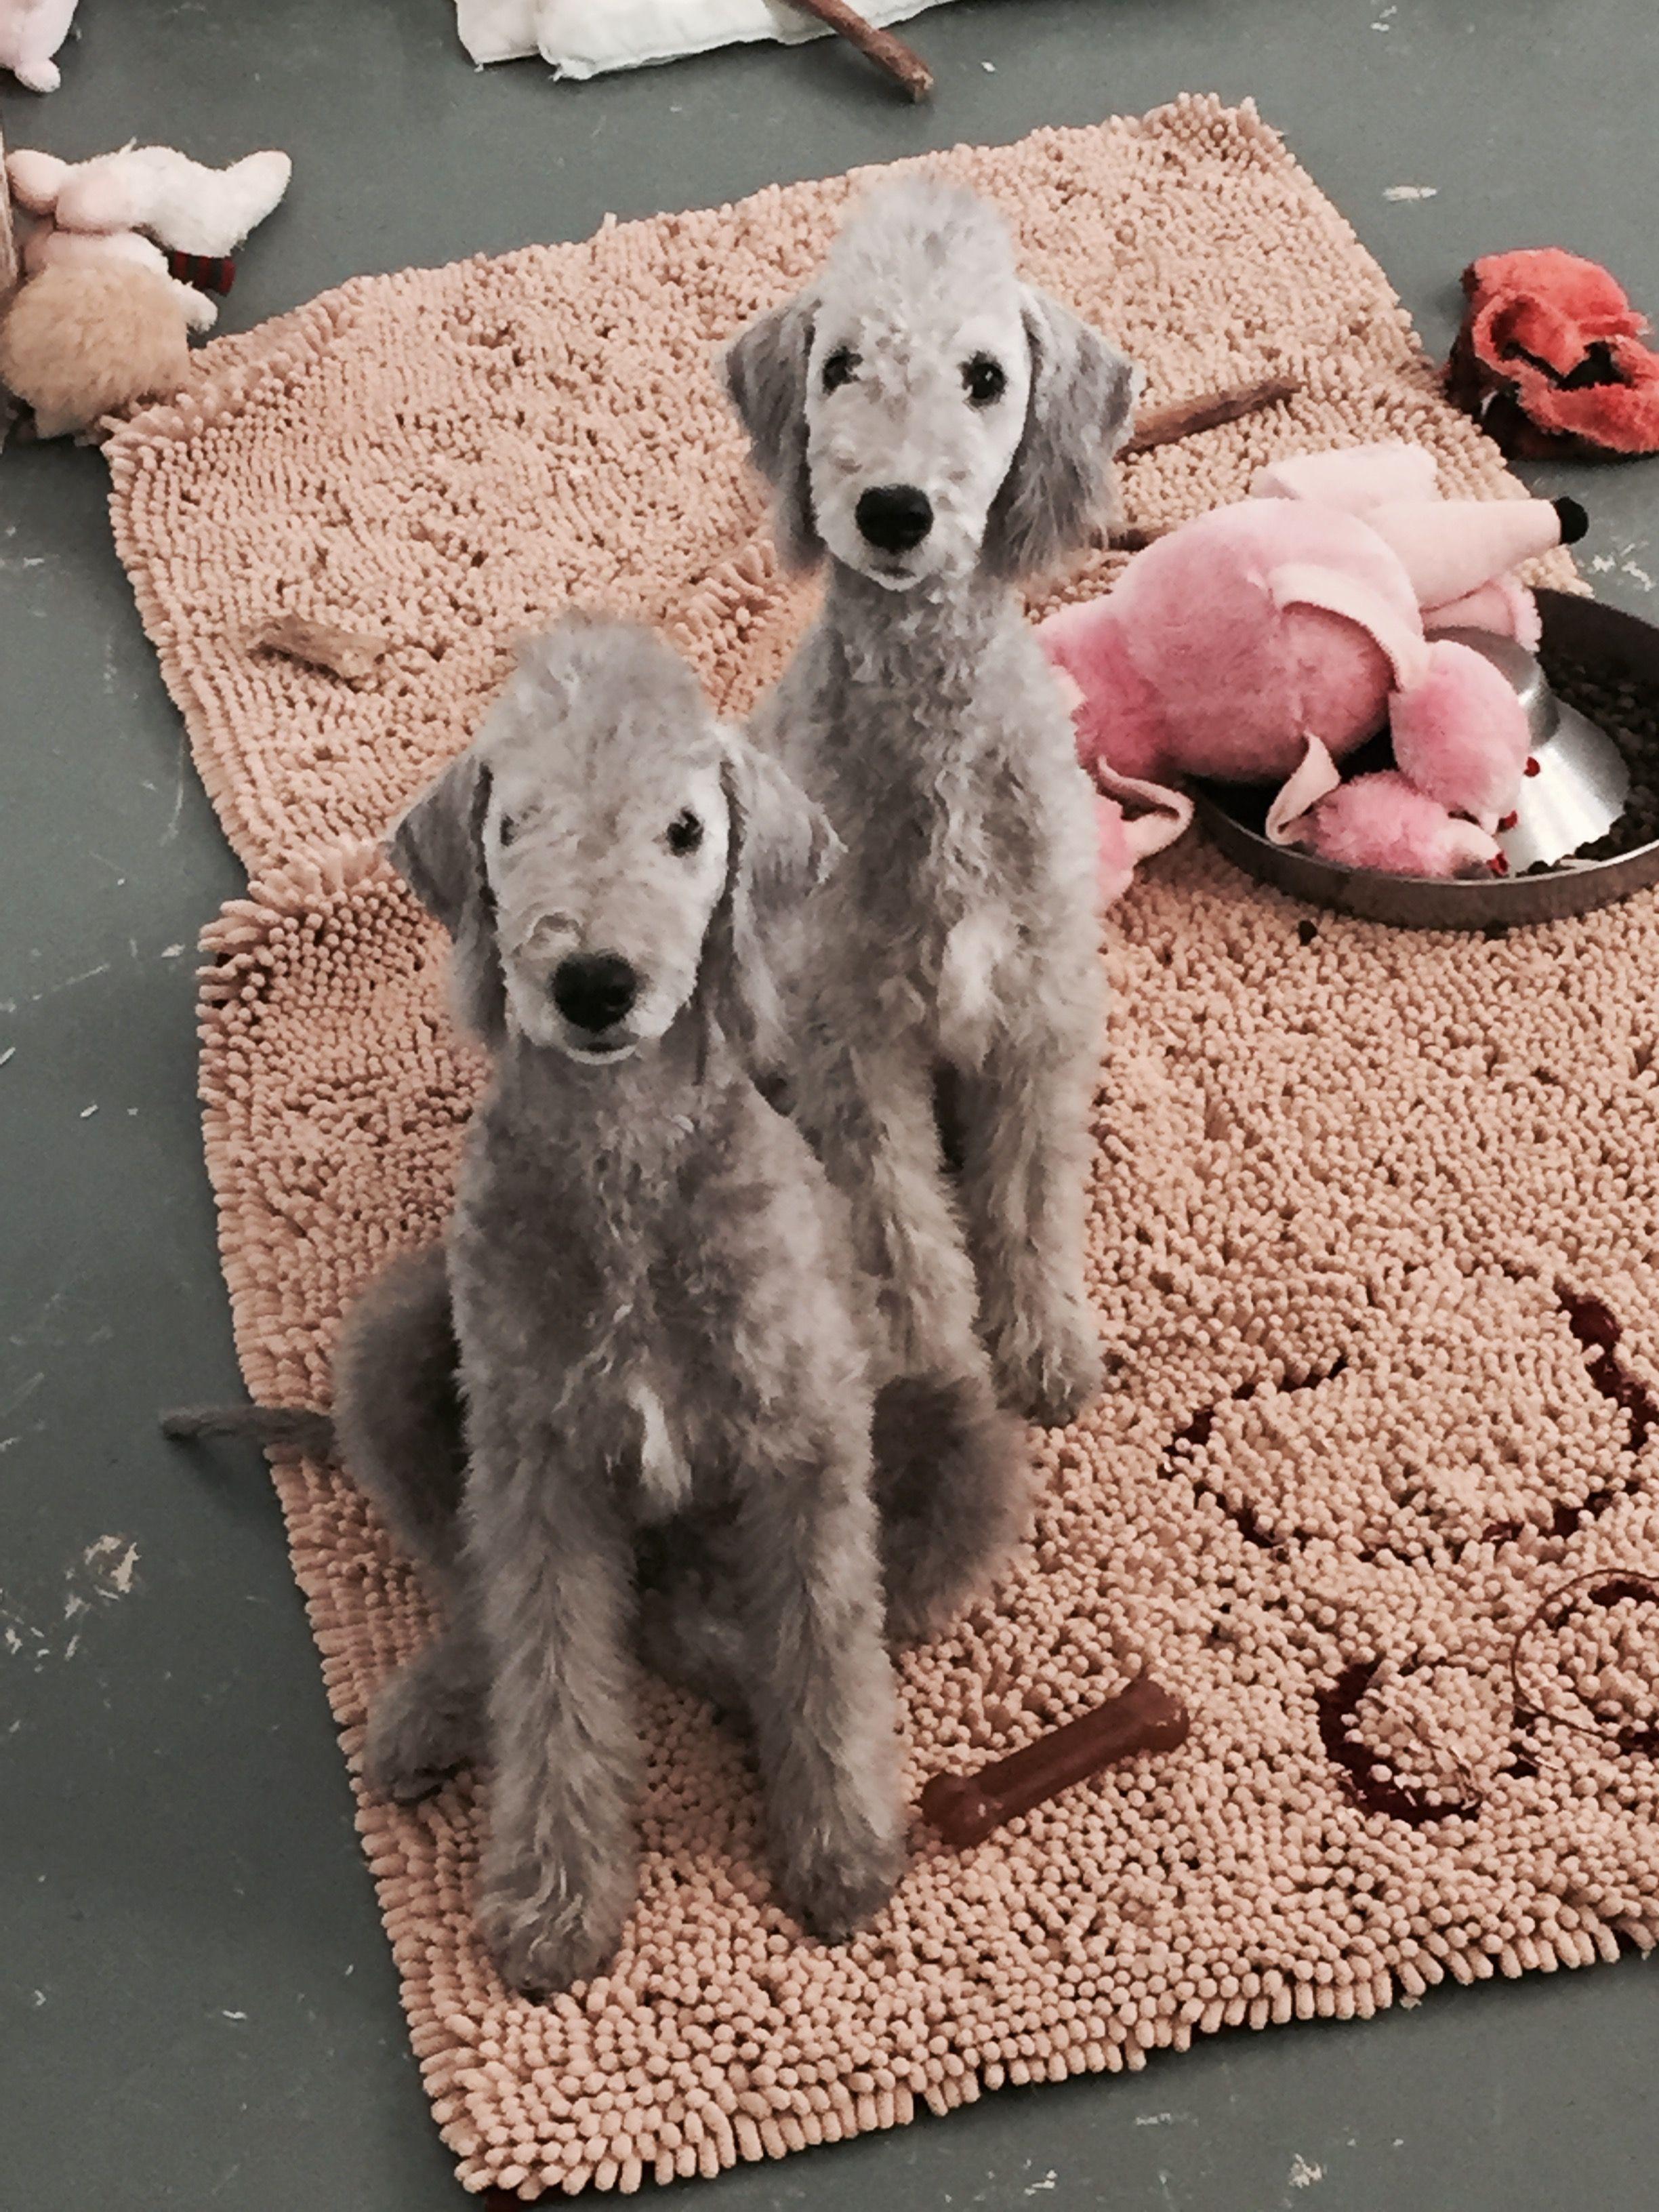 Bedlington Terrier Cute Overload Pinterest Bedlington Terriers